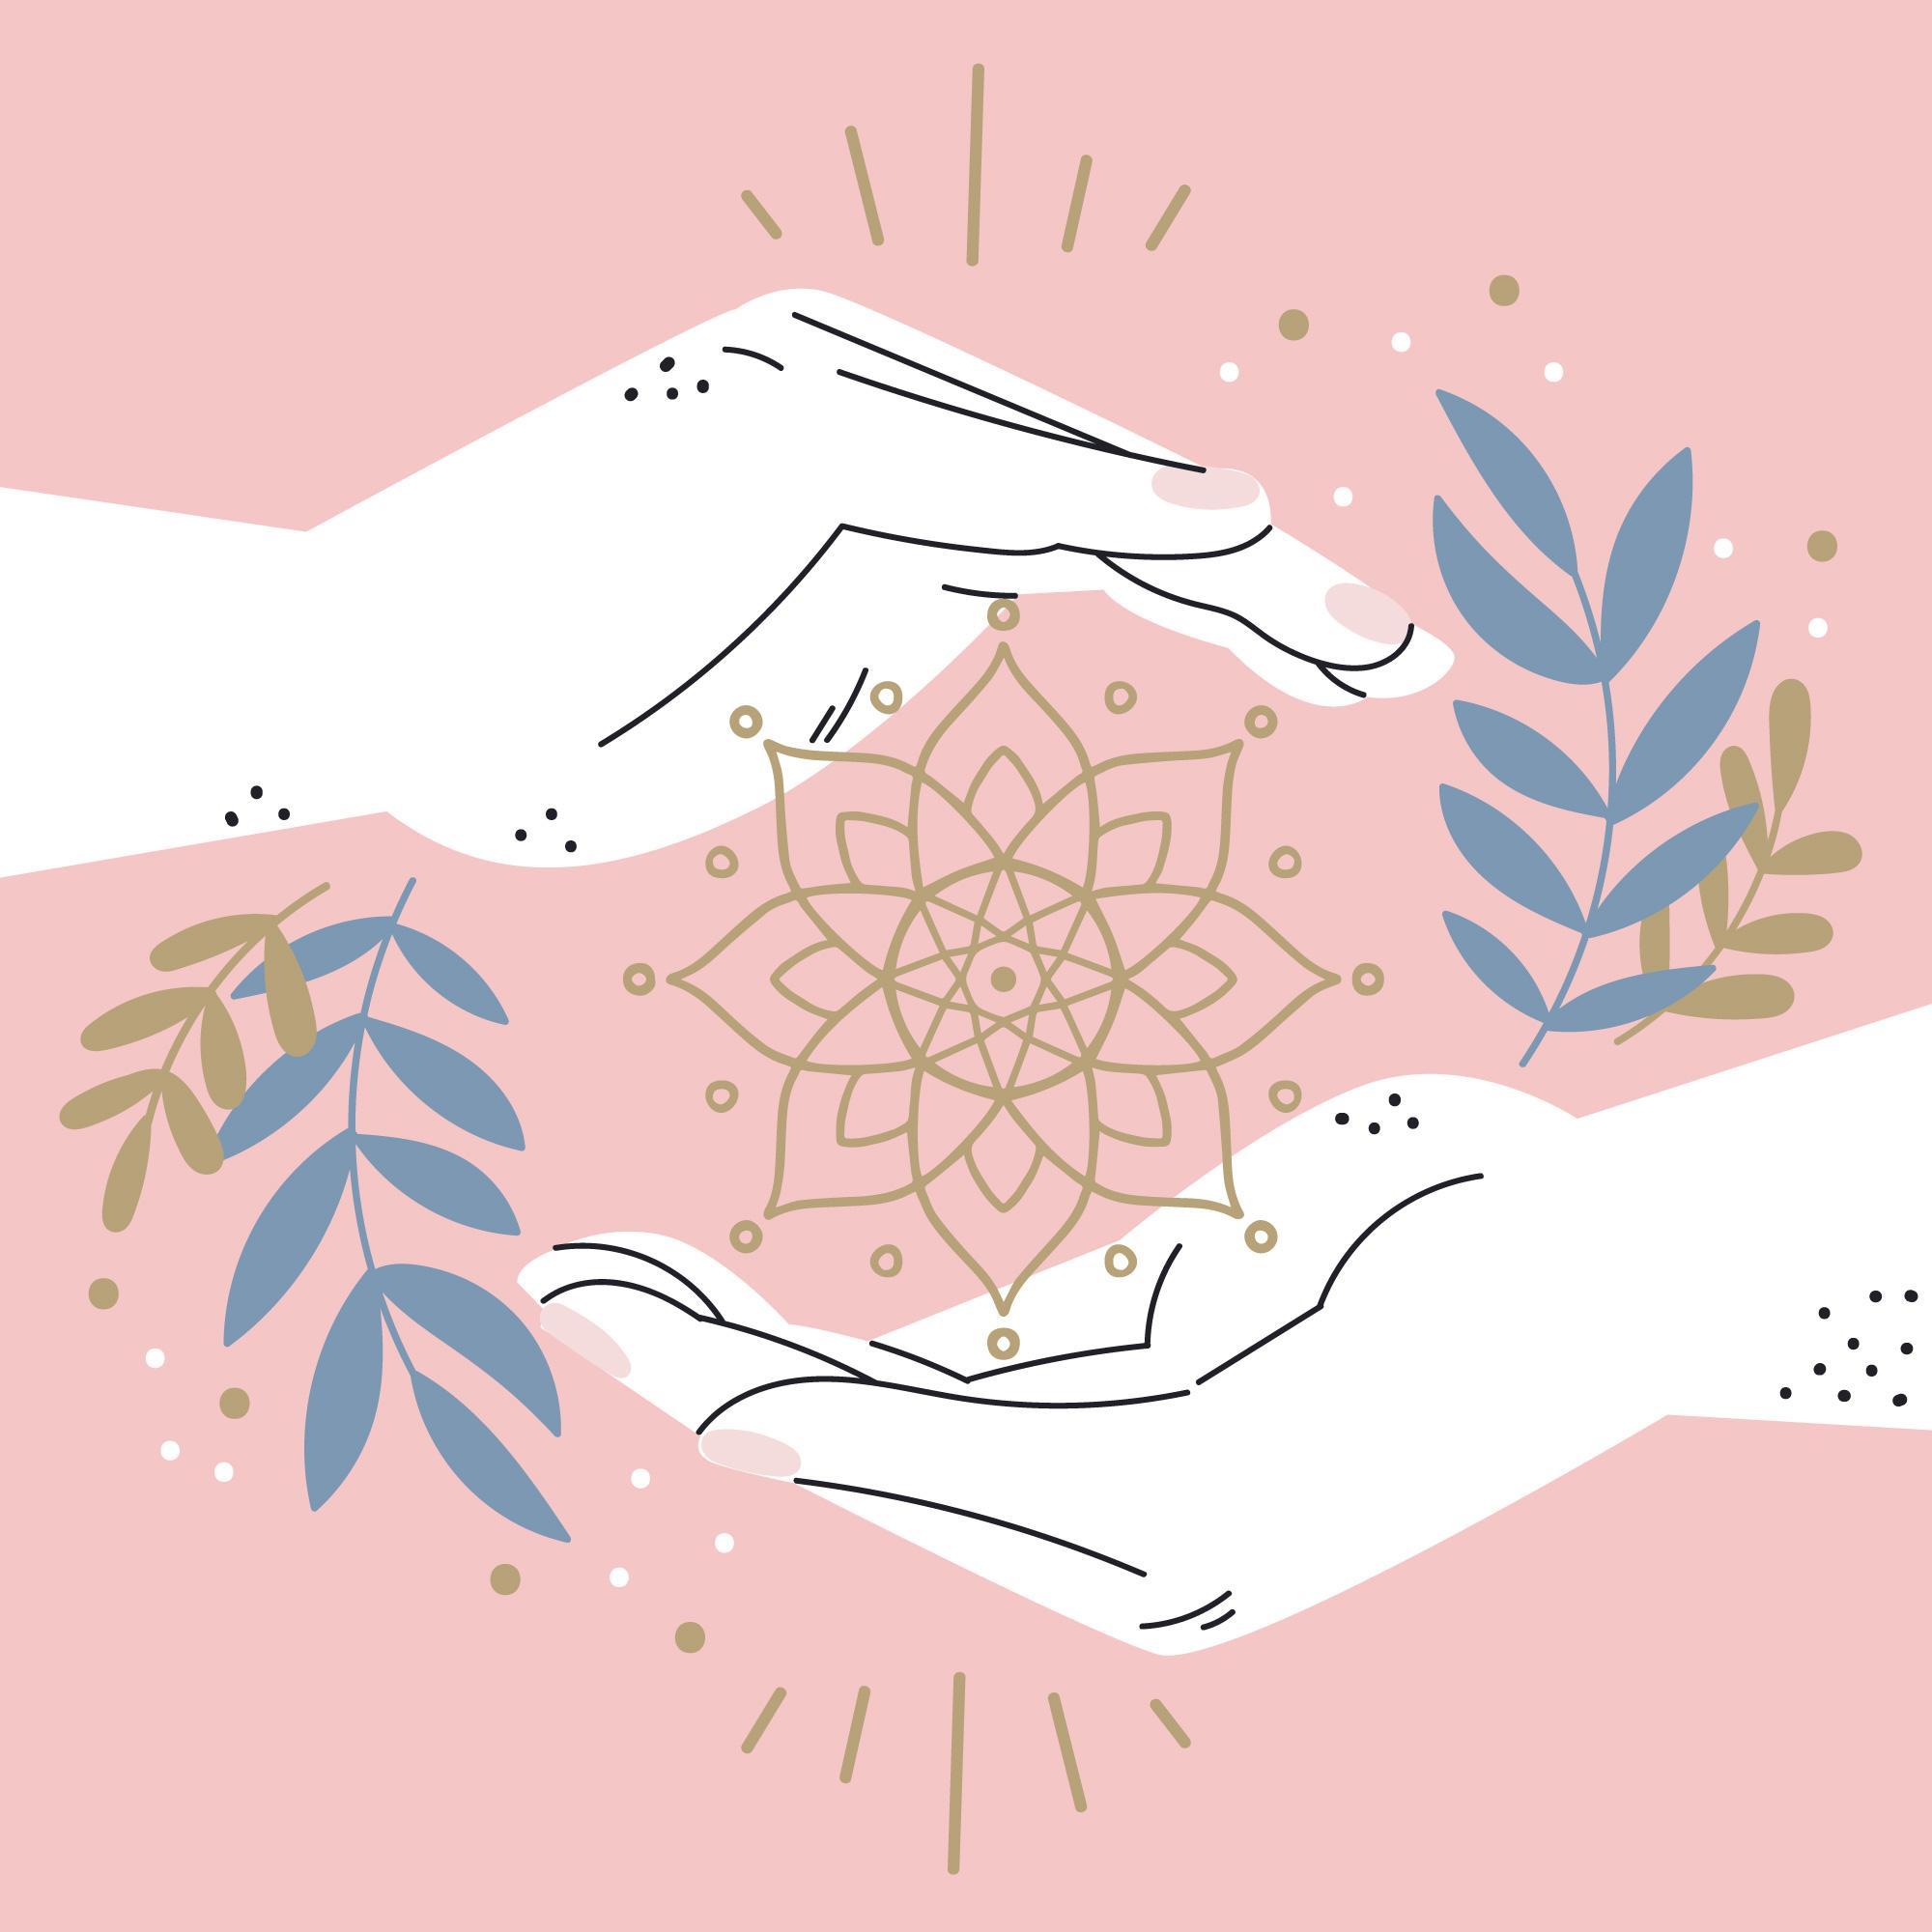 Healing and Positive Energy Globally